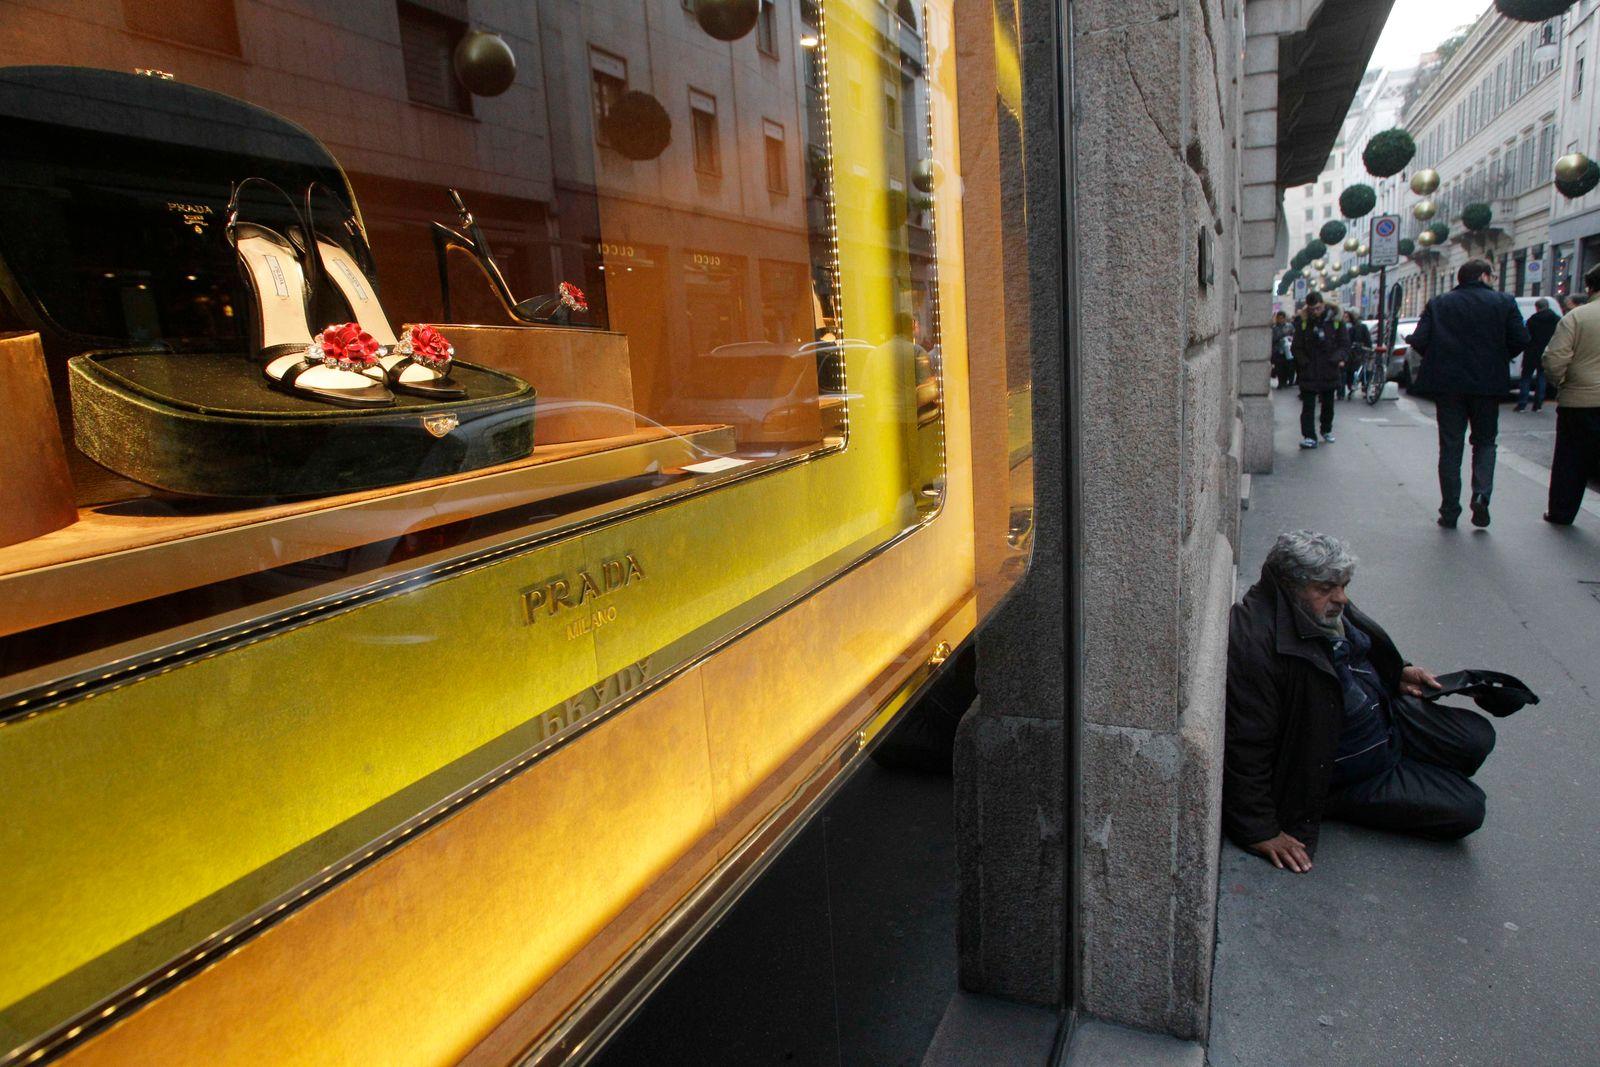 Bettler / Mailand / Prada